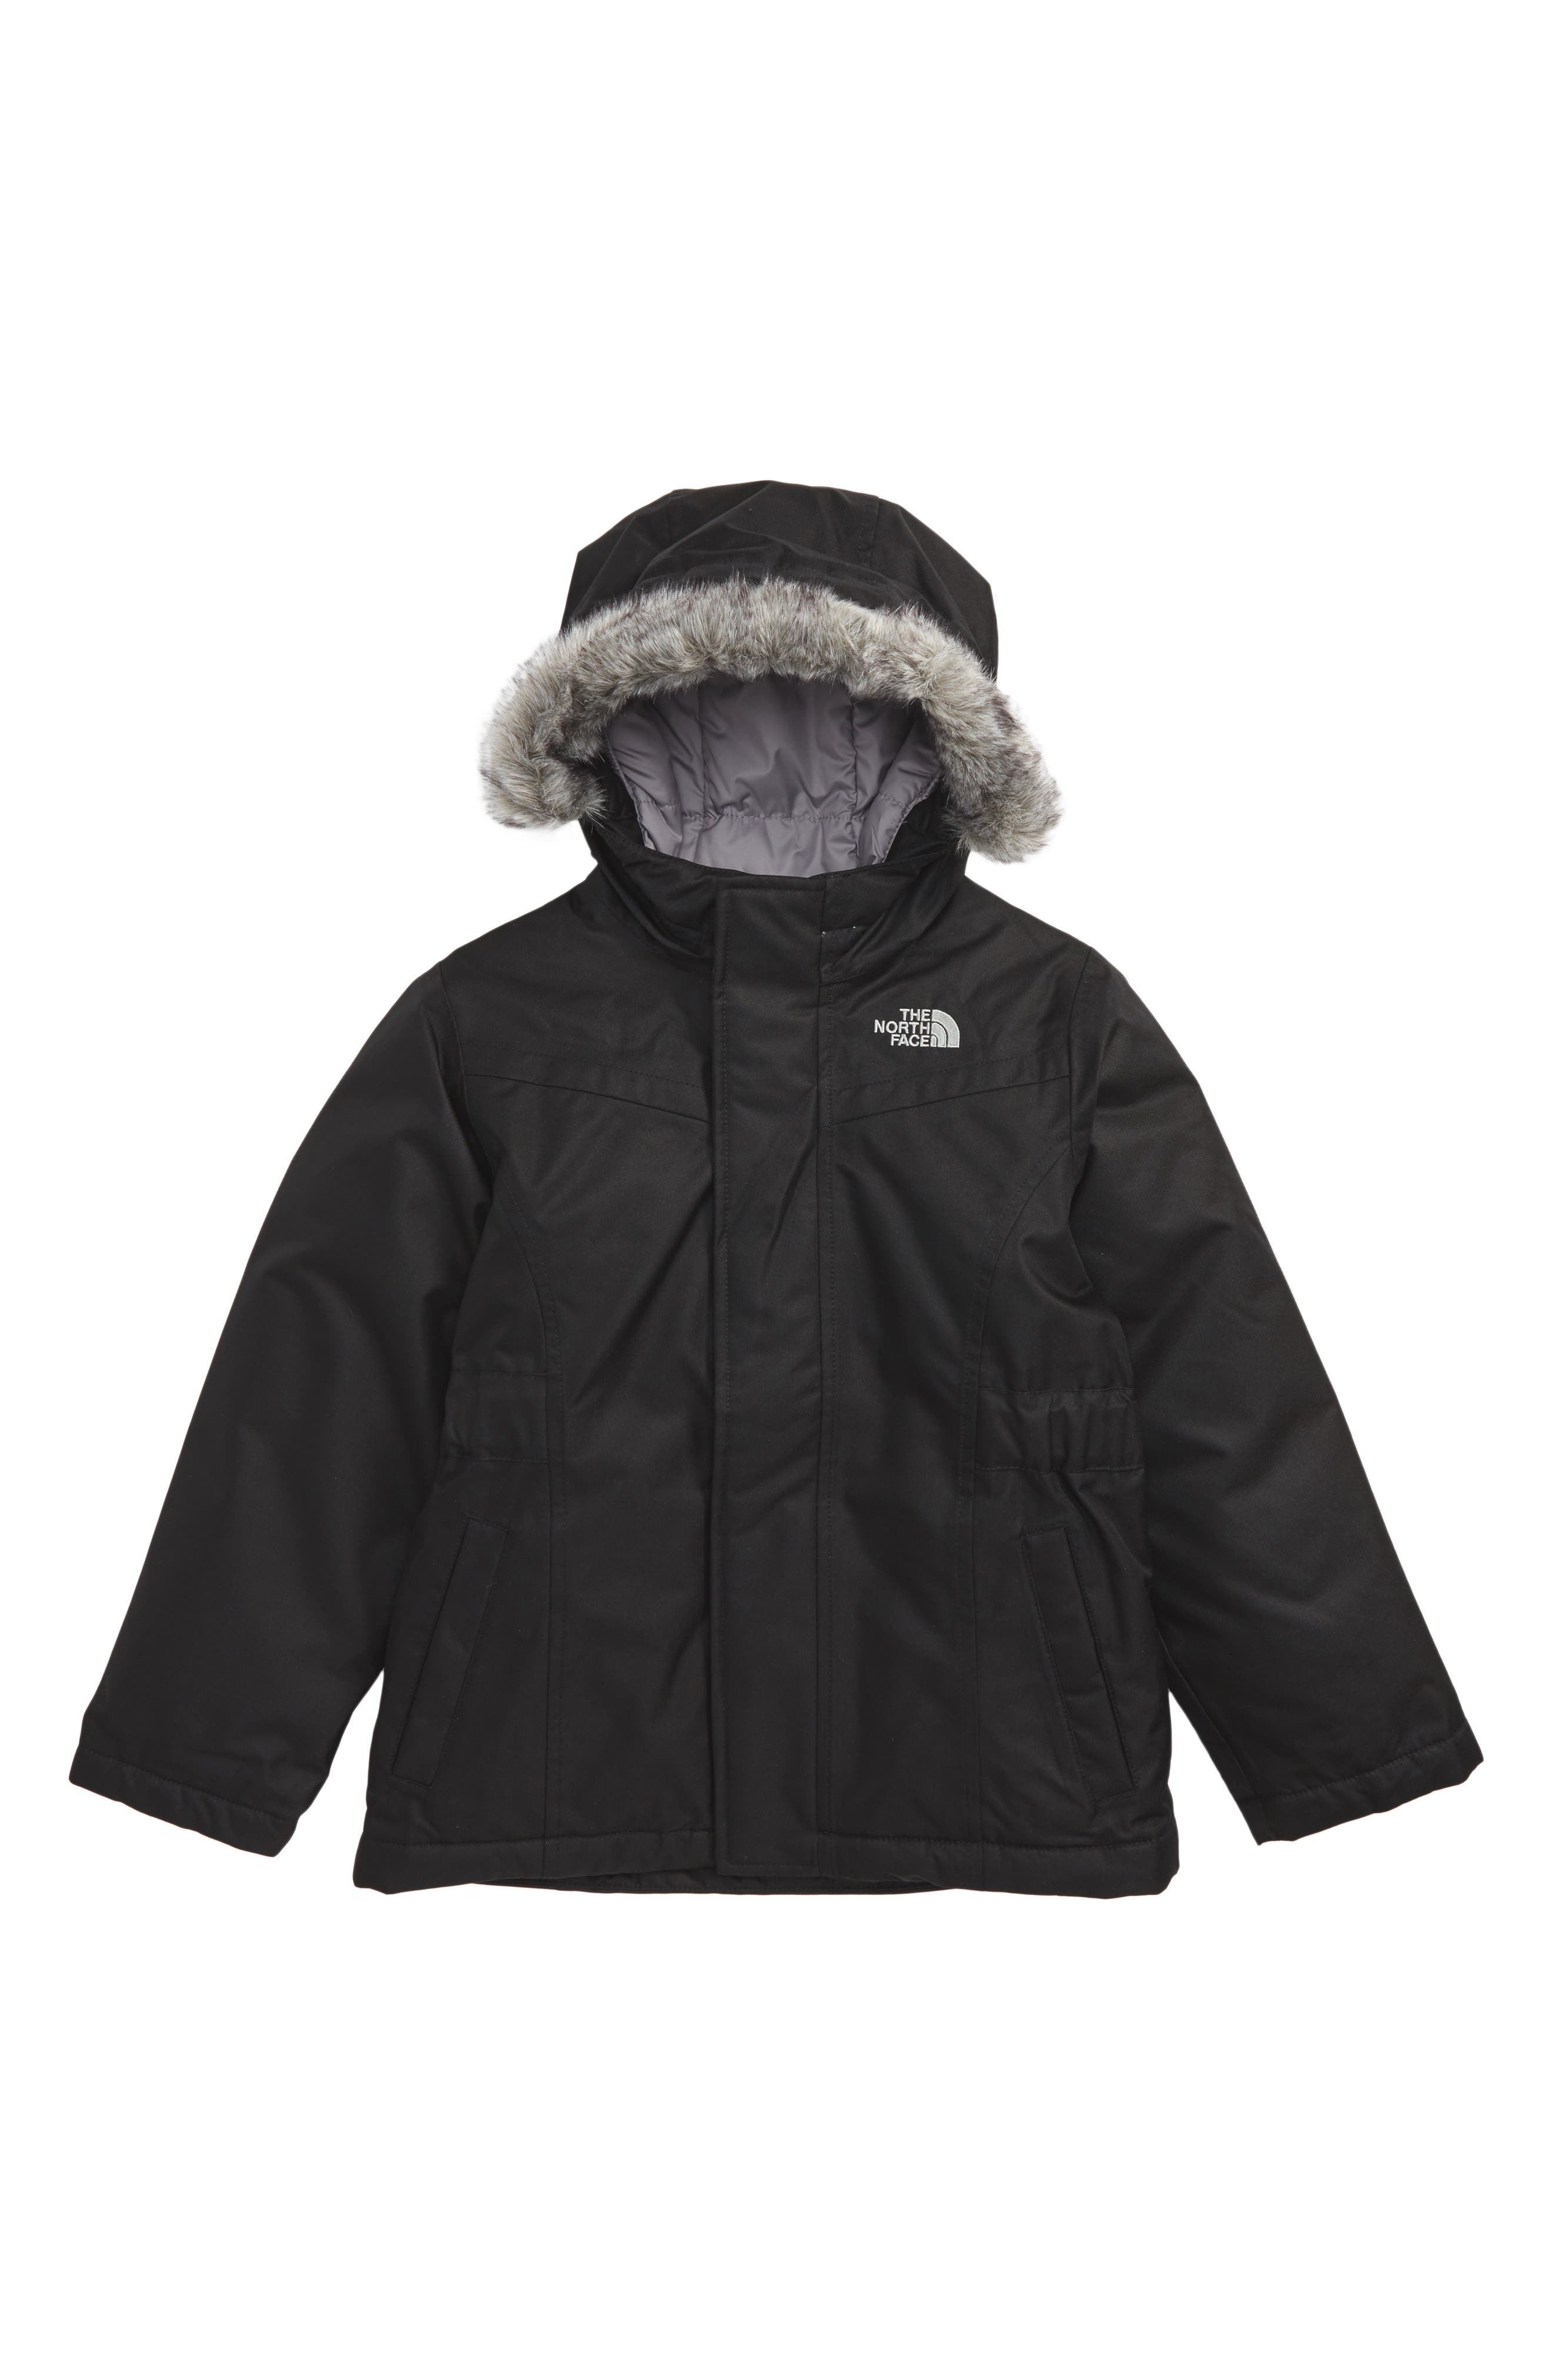 Greenland Waterproof 550-Fill Down Jacket,                         Main,                         color, Tnf Black